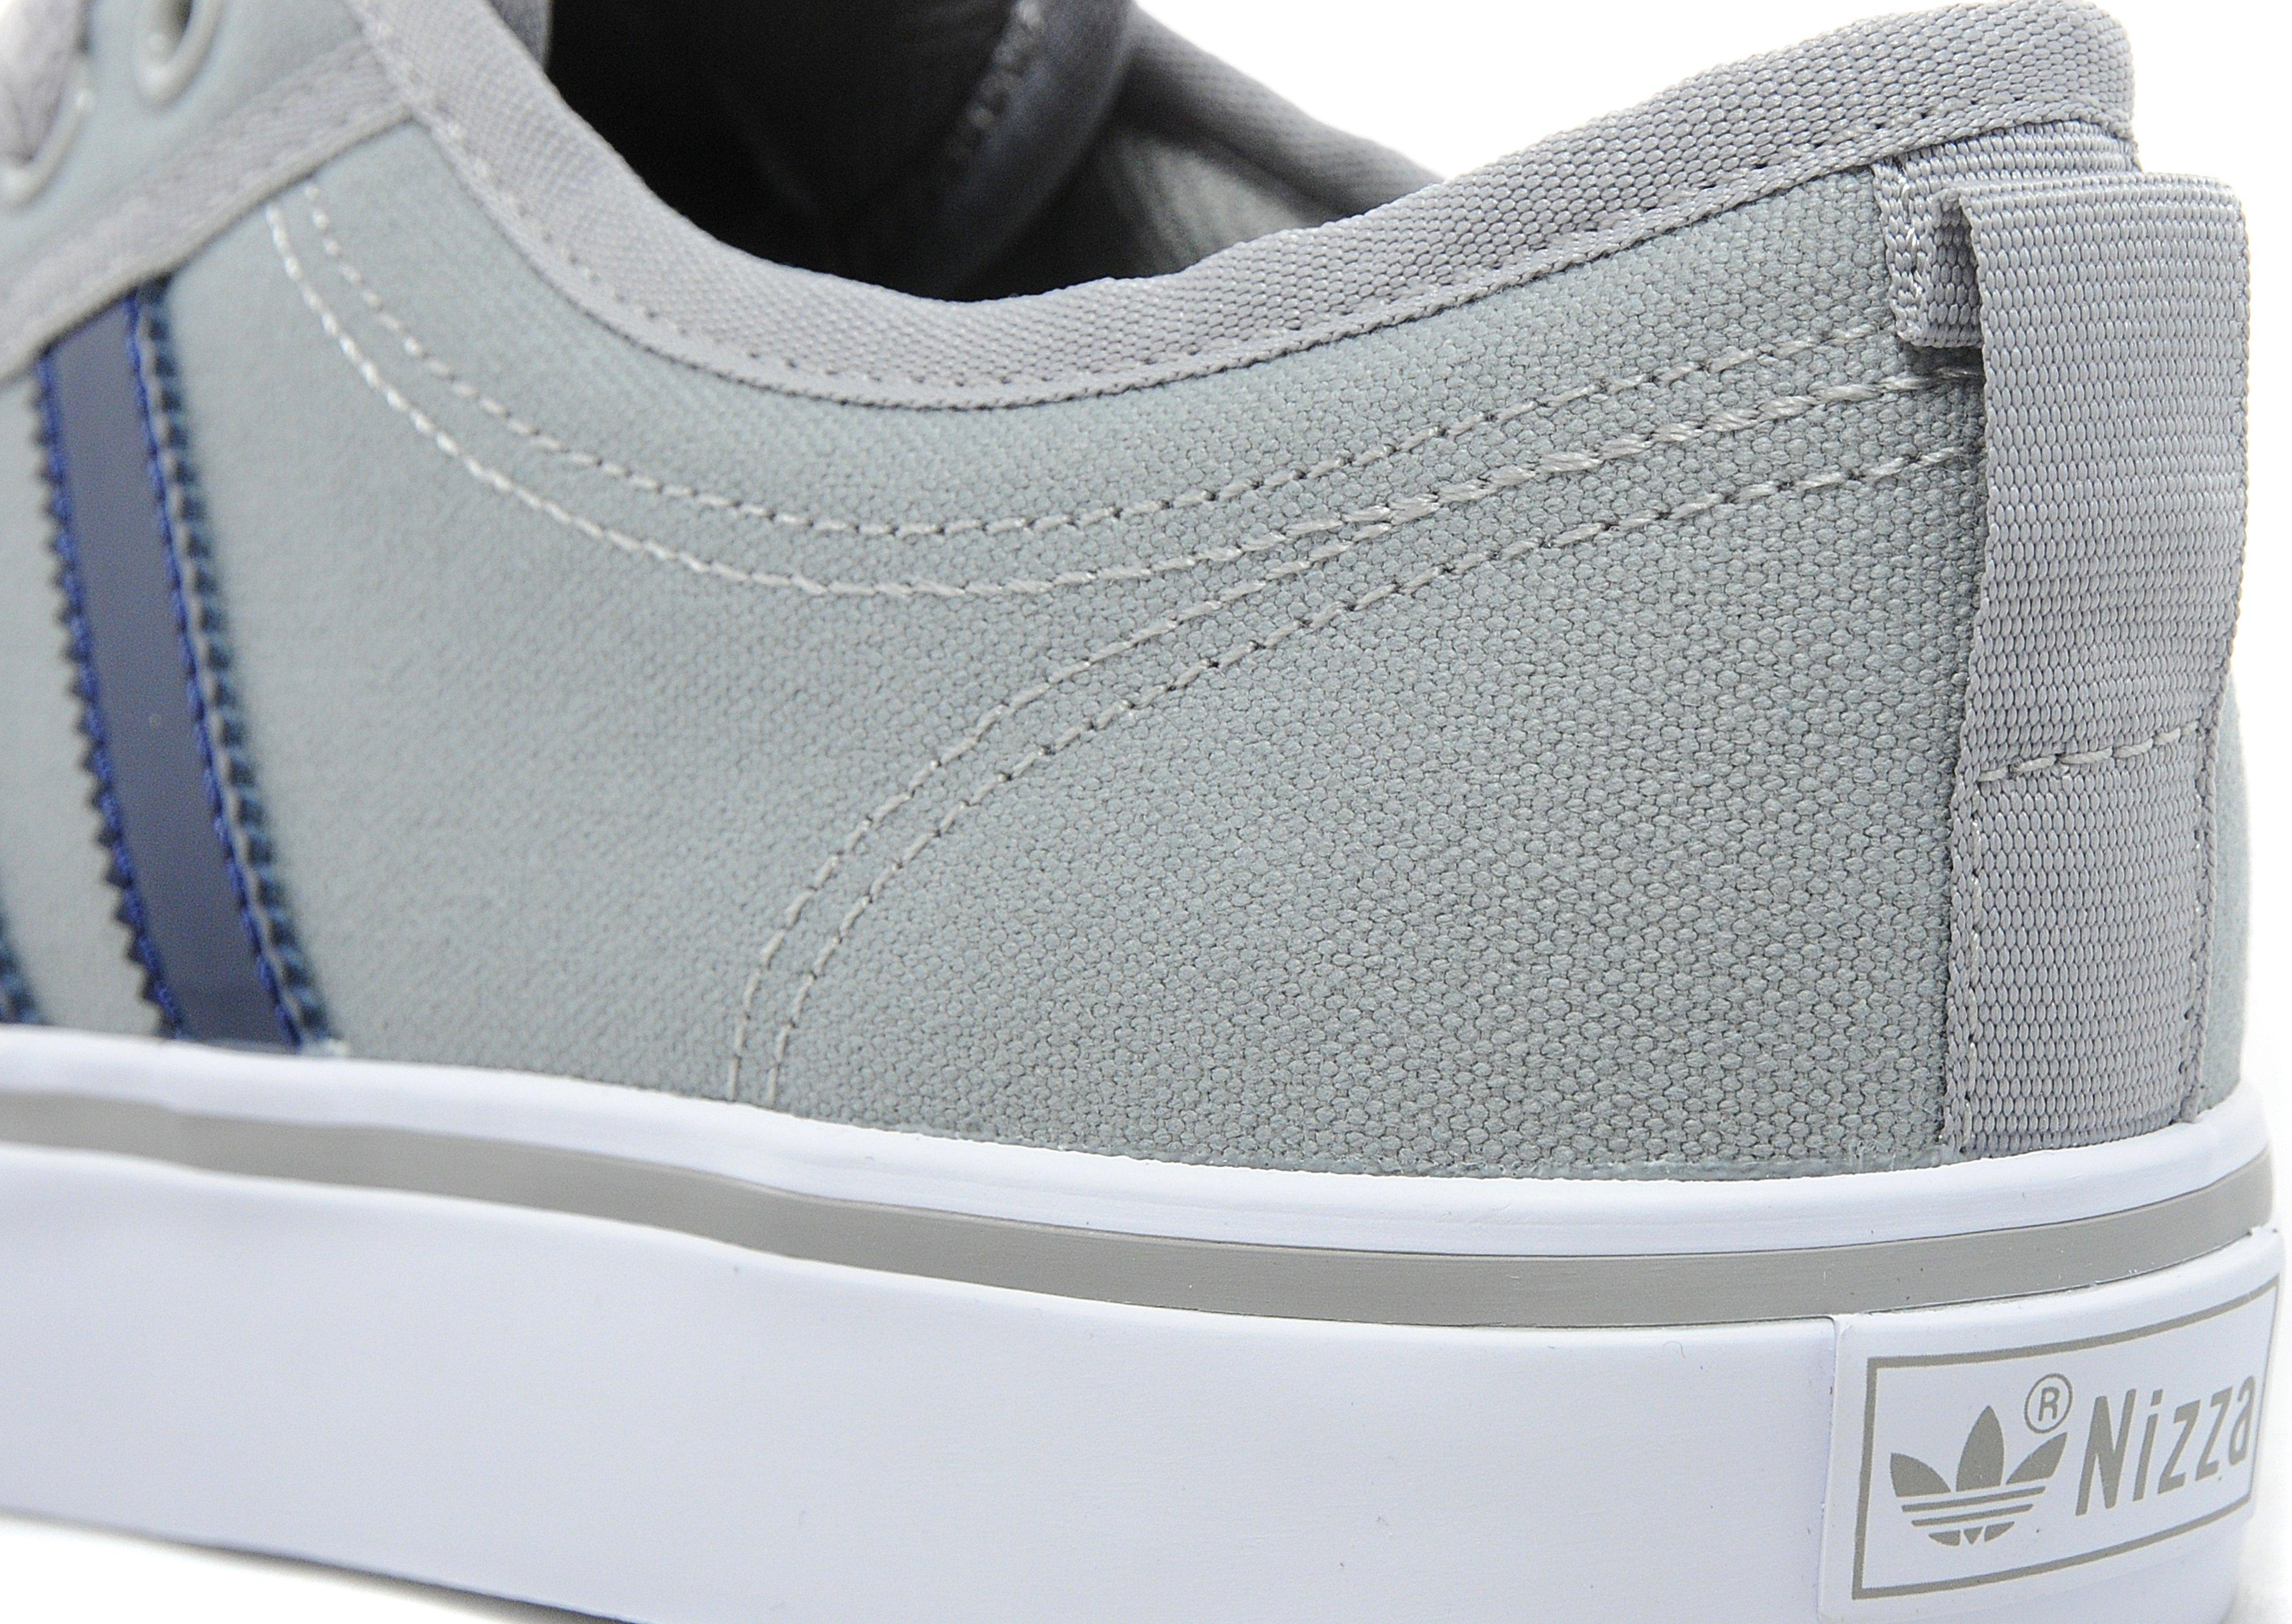 Lyst - adidas Originals Nizza Lo in Blue for Men 901719060